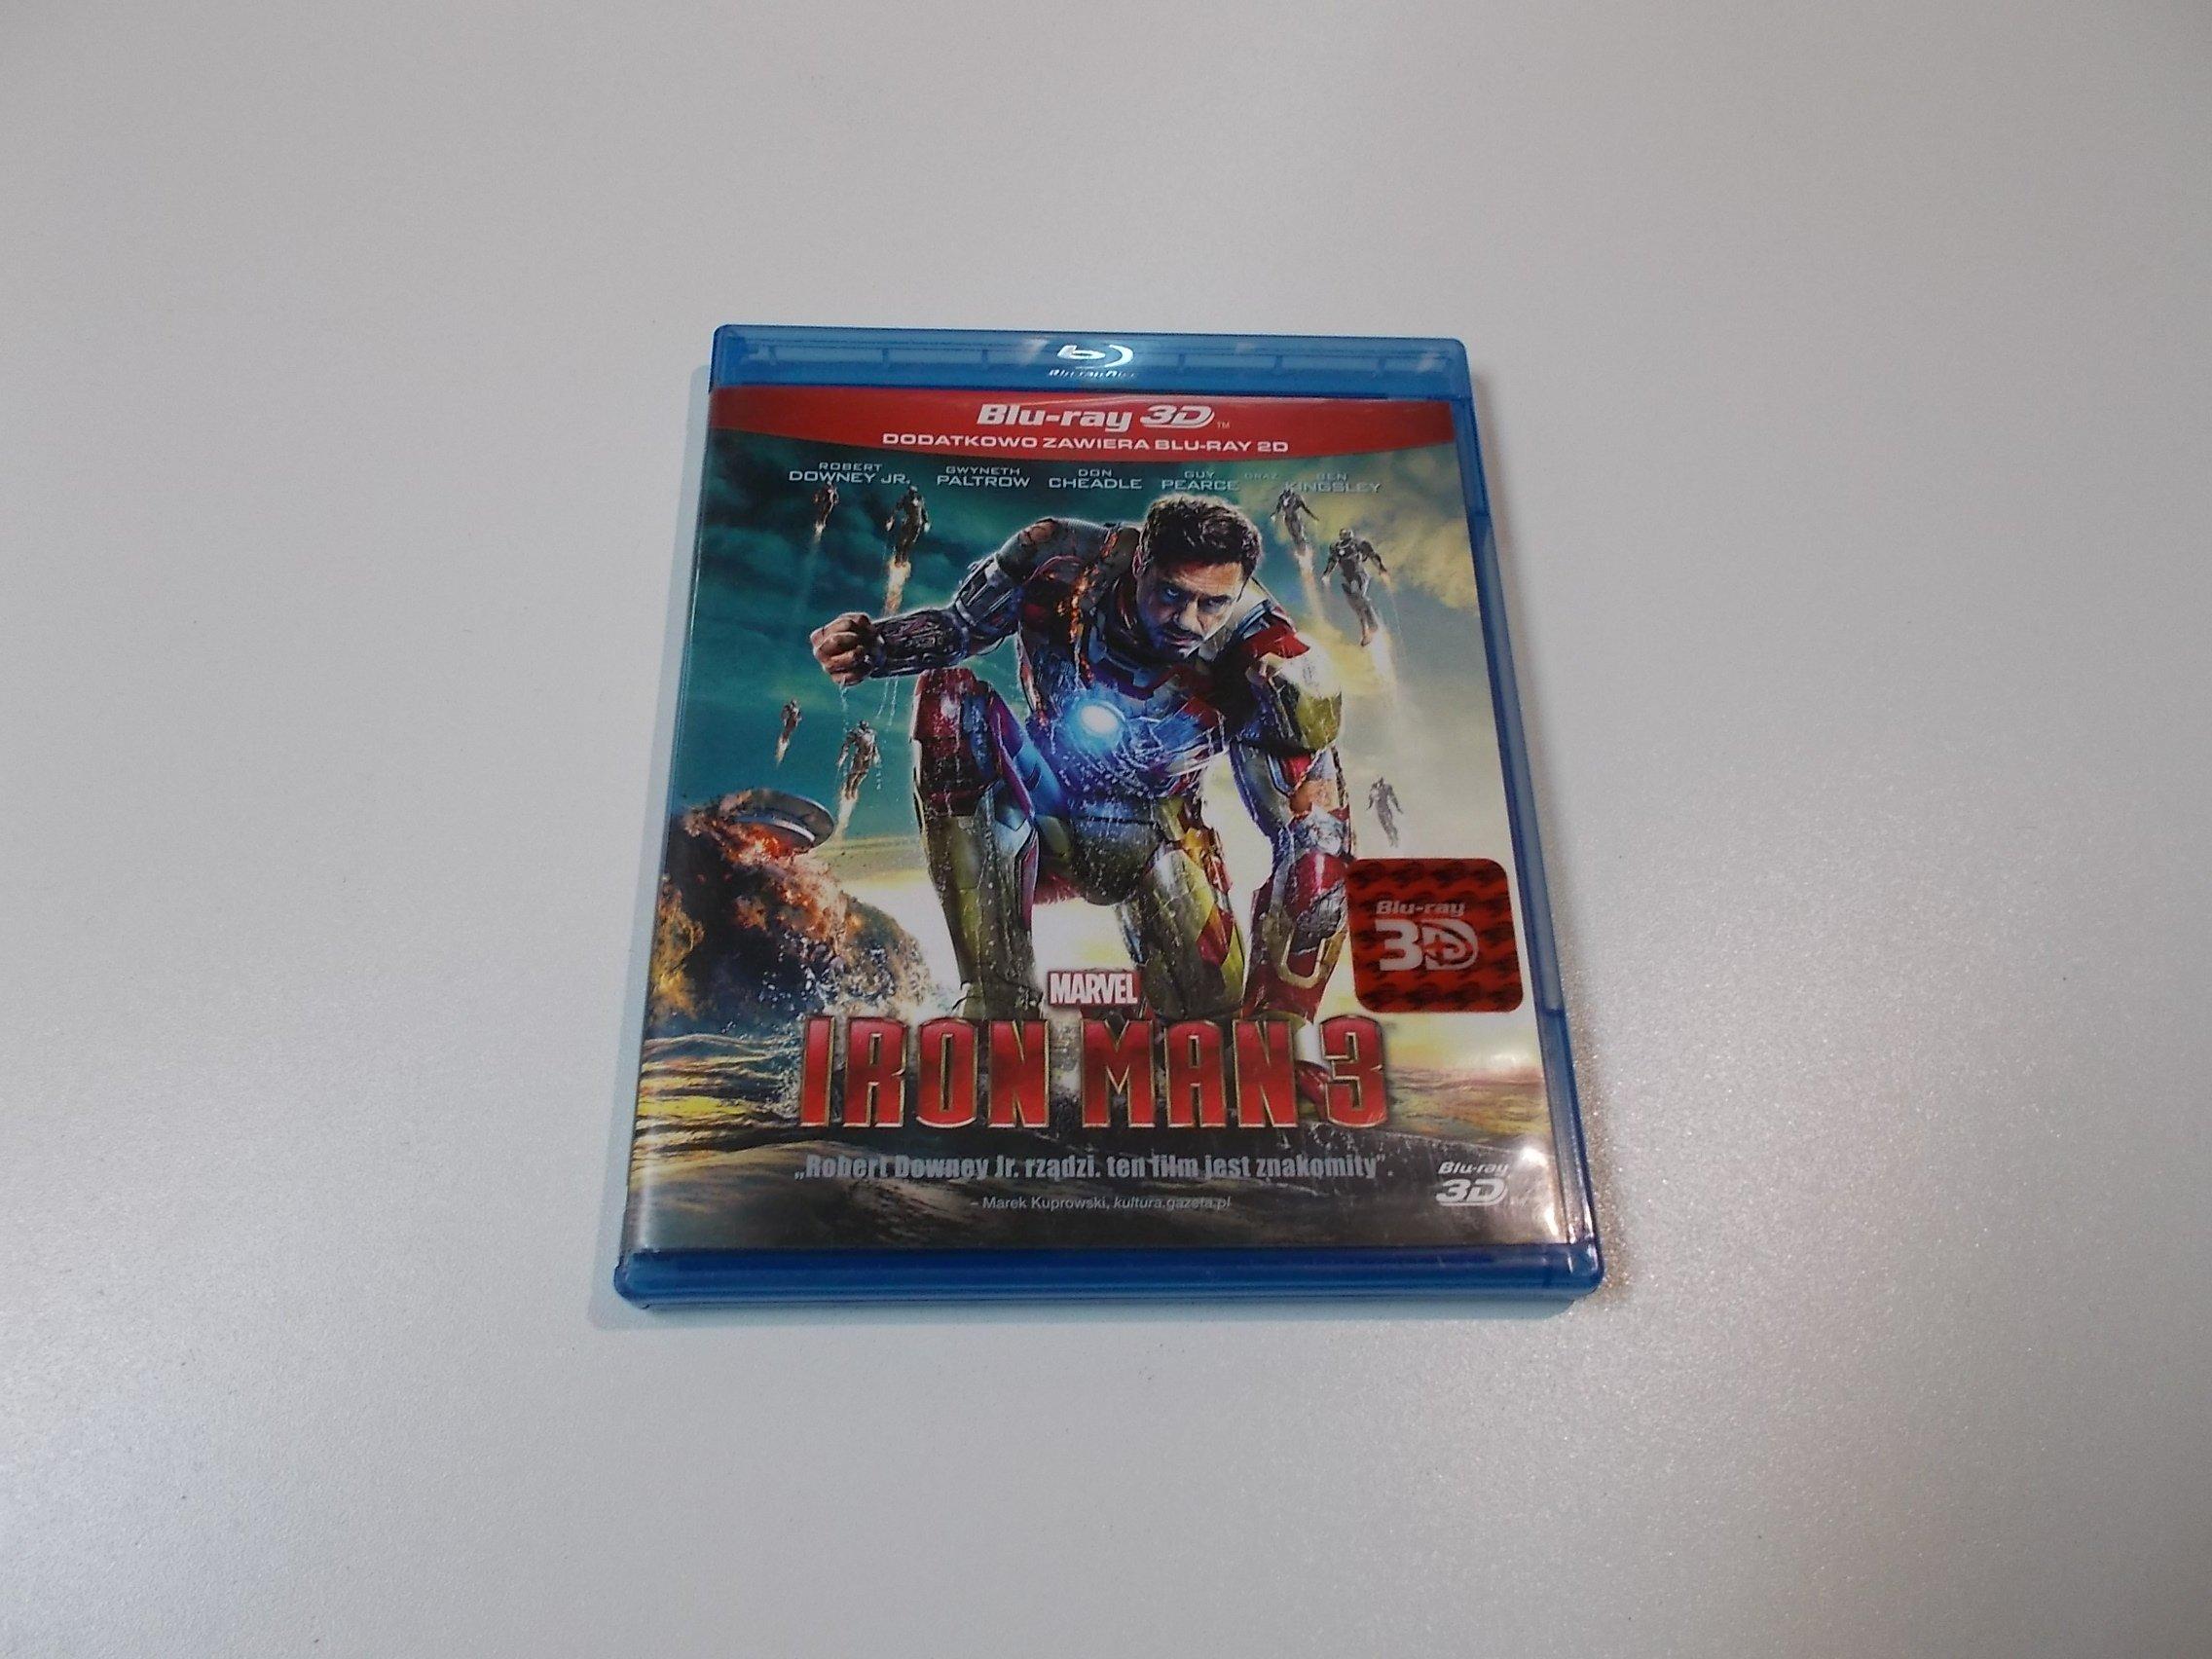 IRON MAN 3 MARVEL - Blu-ray 3D - Sklep